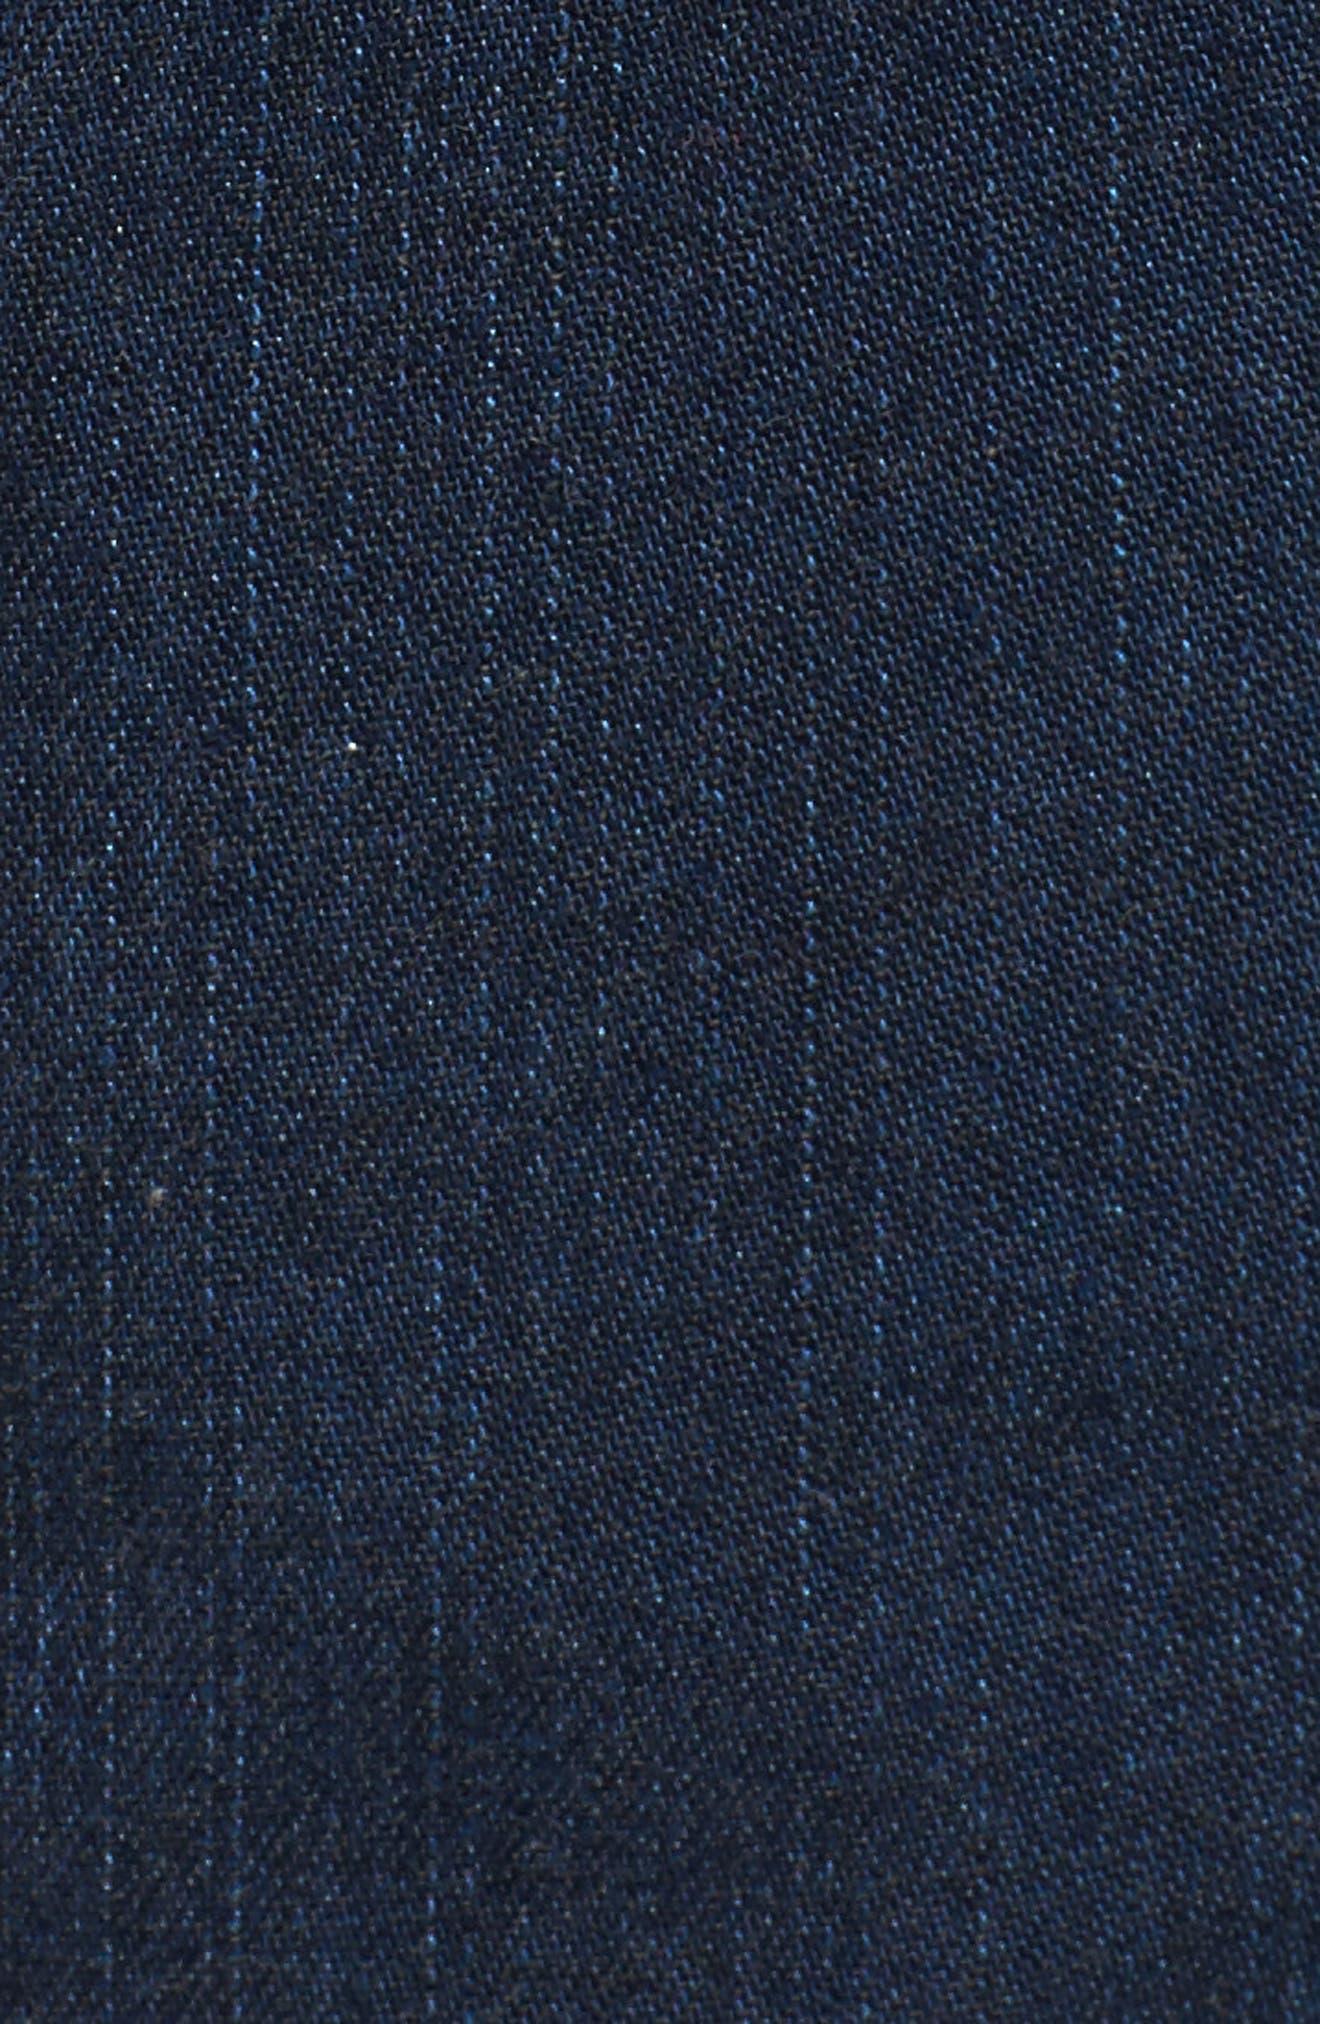 Tencel<sup>®</sup> Lyocell & Organic Cotton Walking Shorts,                             Alternate thumbnail 5, color,                             419